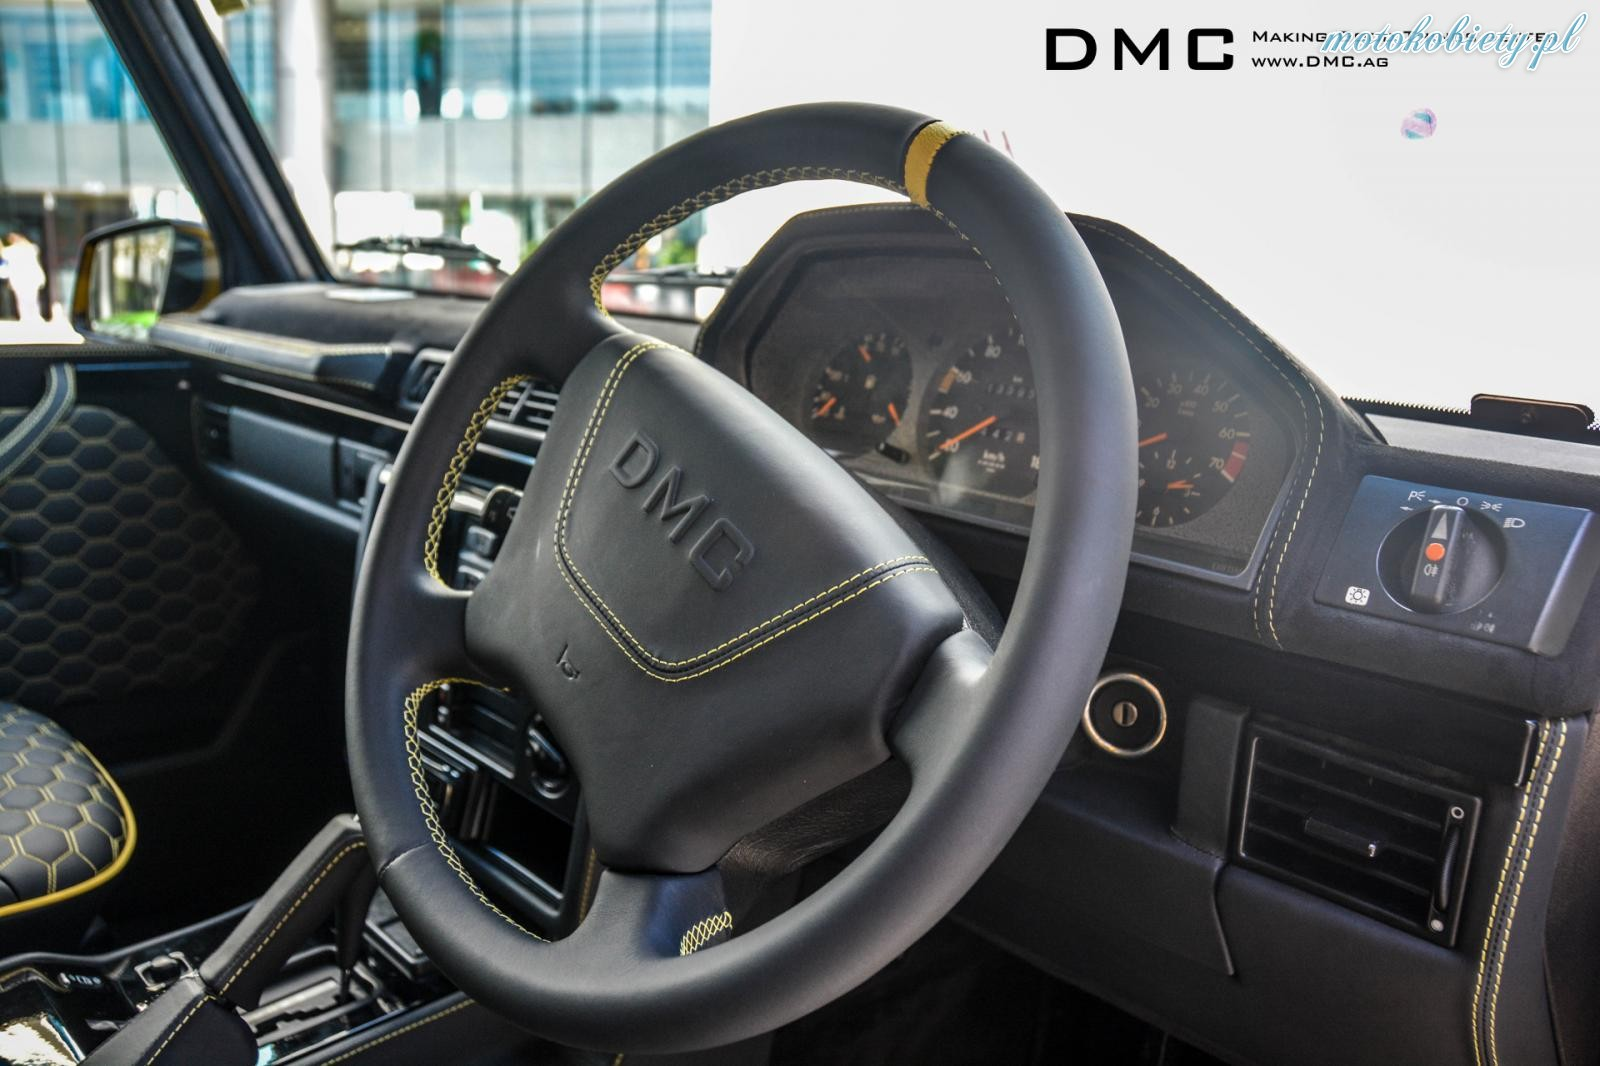 Mercedes G88 DMC